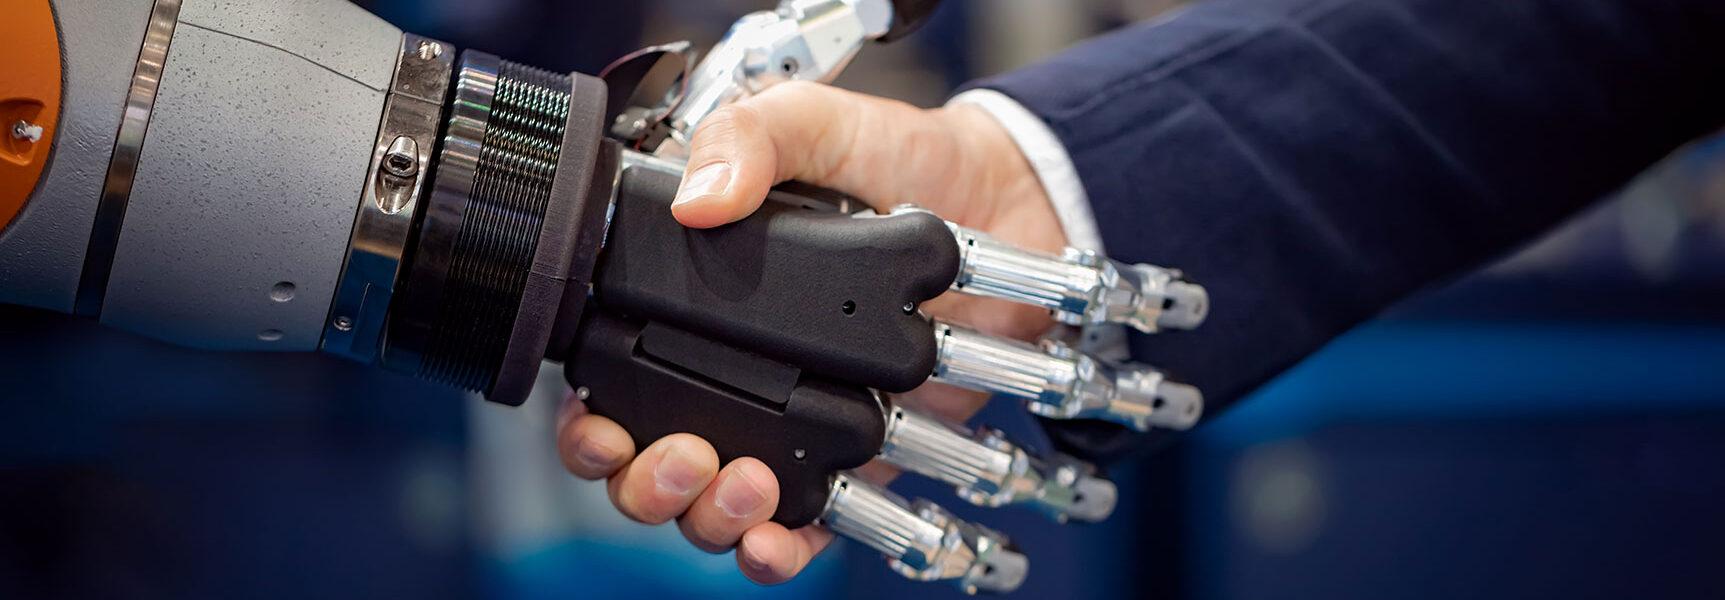 robots hand shake